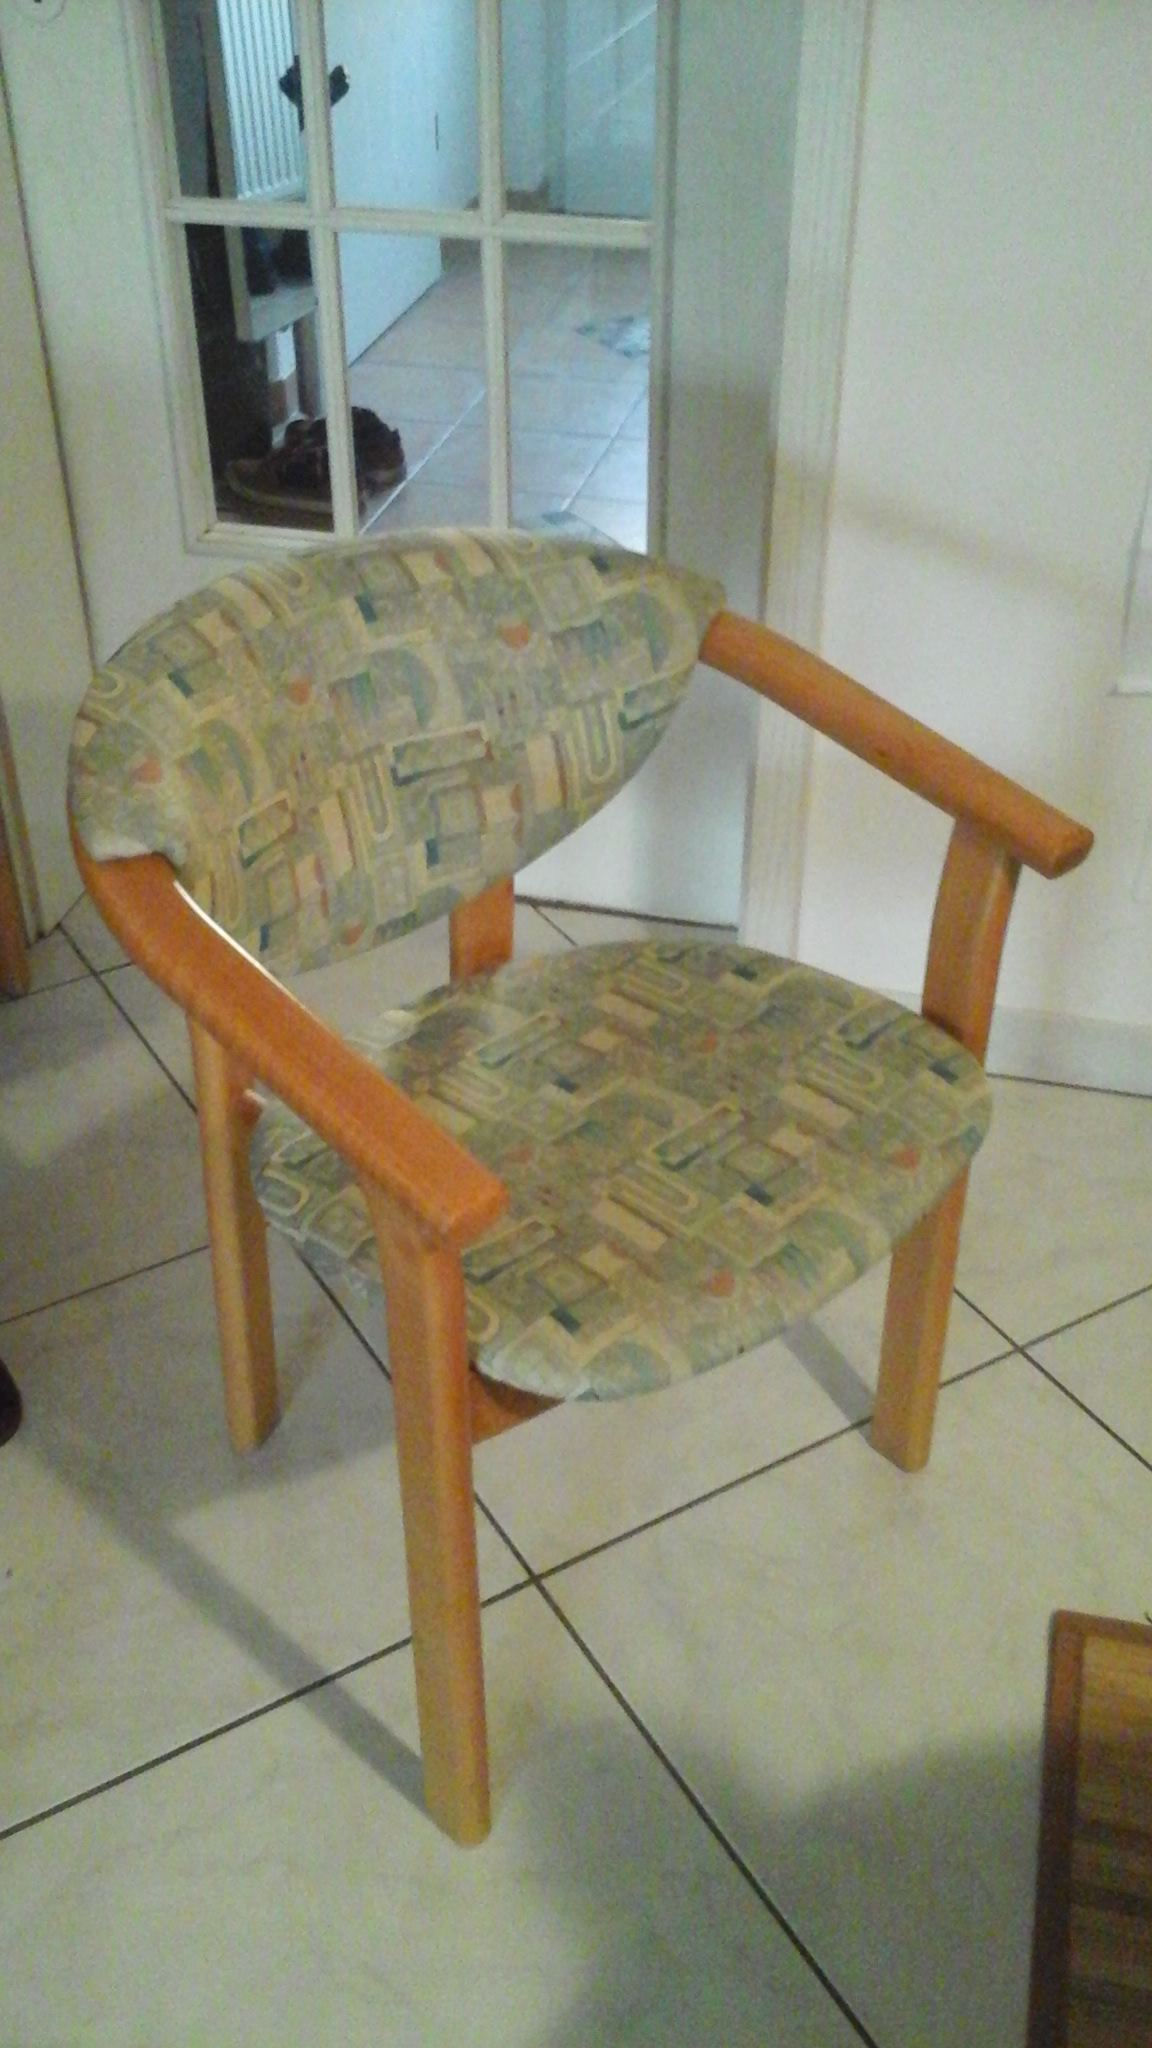 st hle gesucht wer weiss. Black Bedroom Furniture Sets. Home Design Ideas